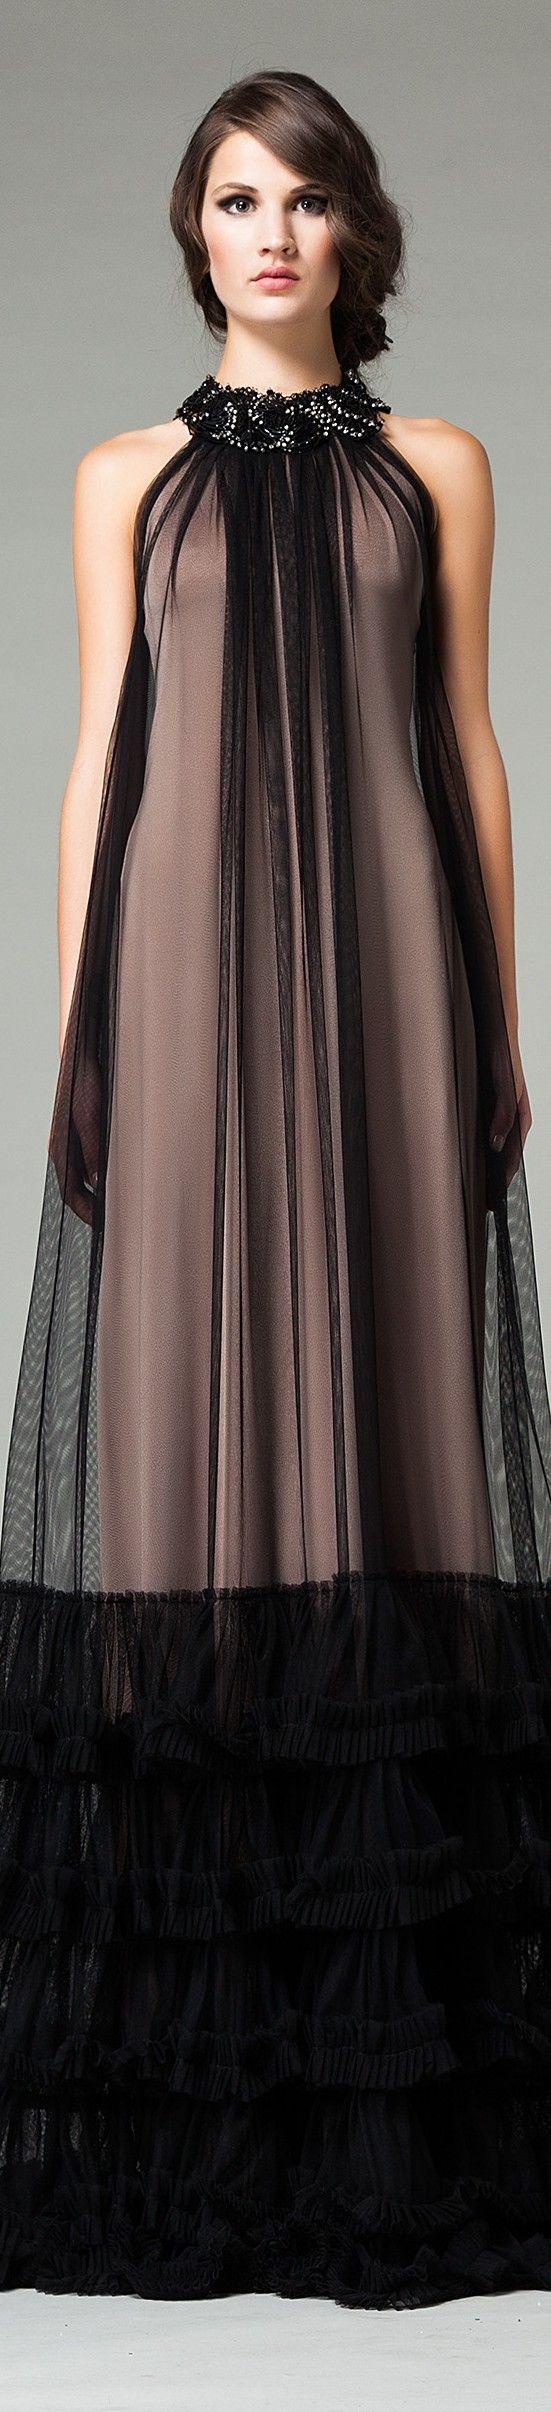 maxi dress size 8 artist